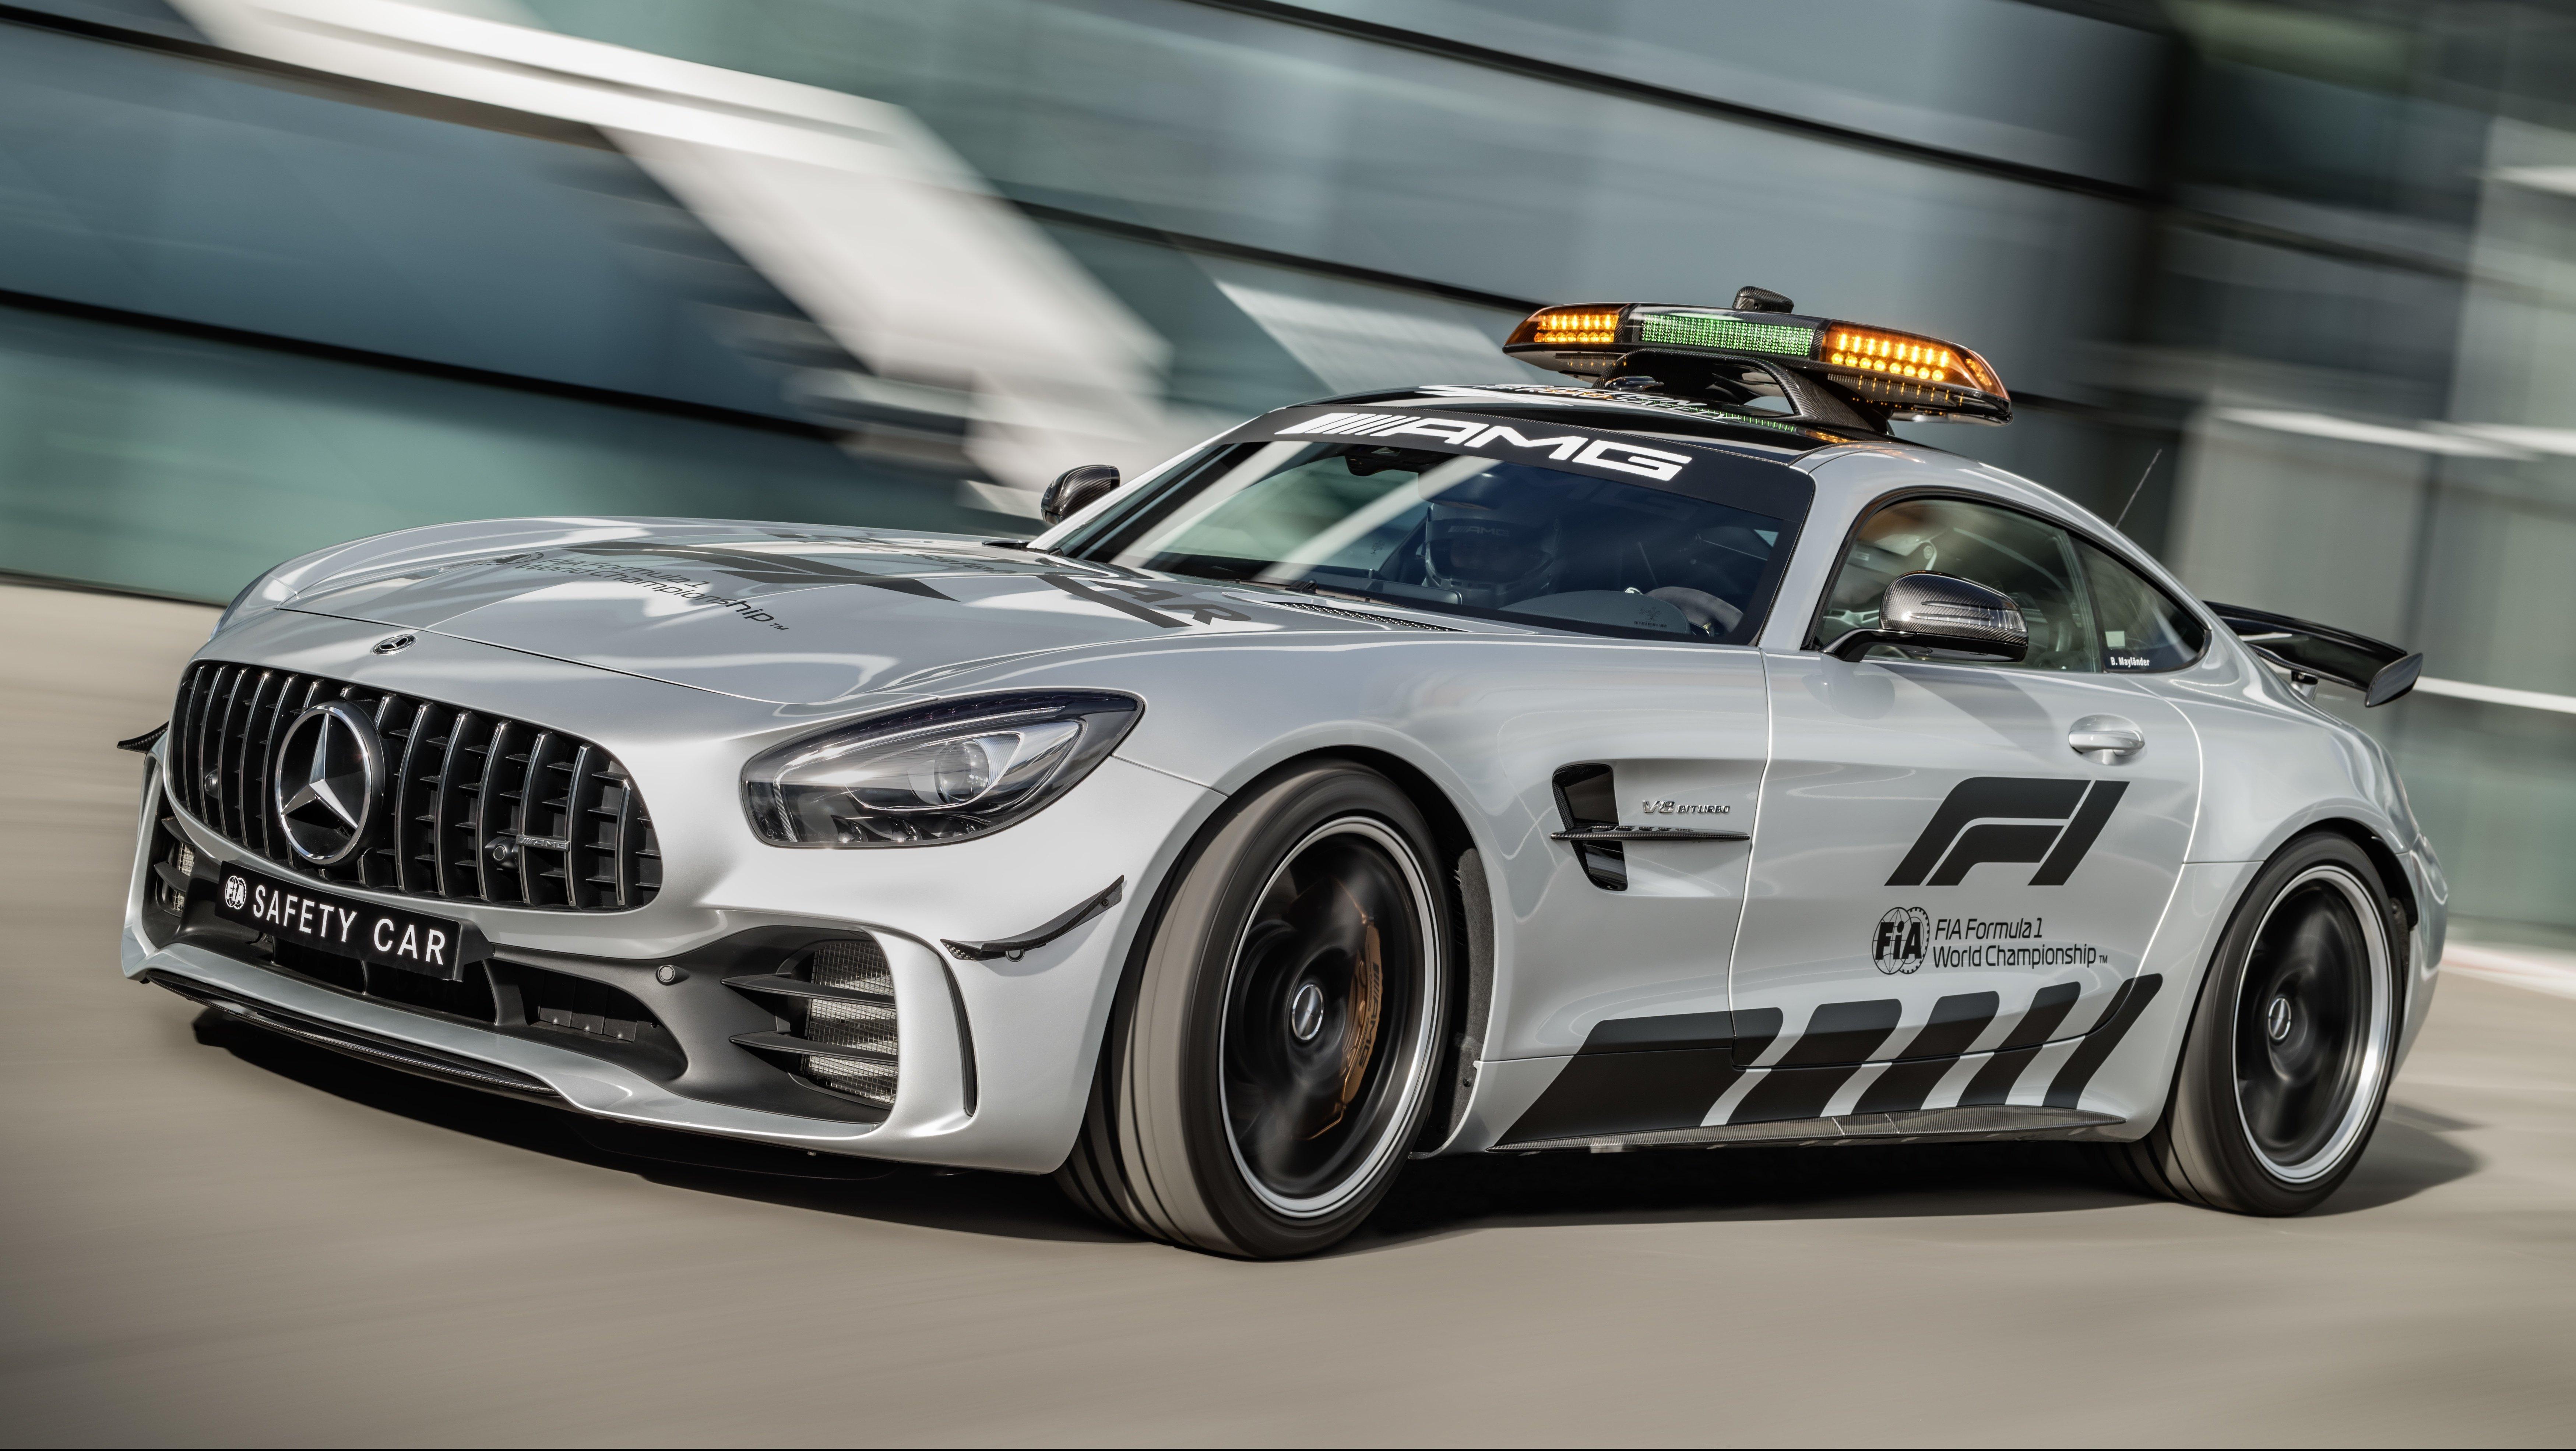 Mercedes amg gt r most powerful f1 safety car paul tan for Mercedes benz f1